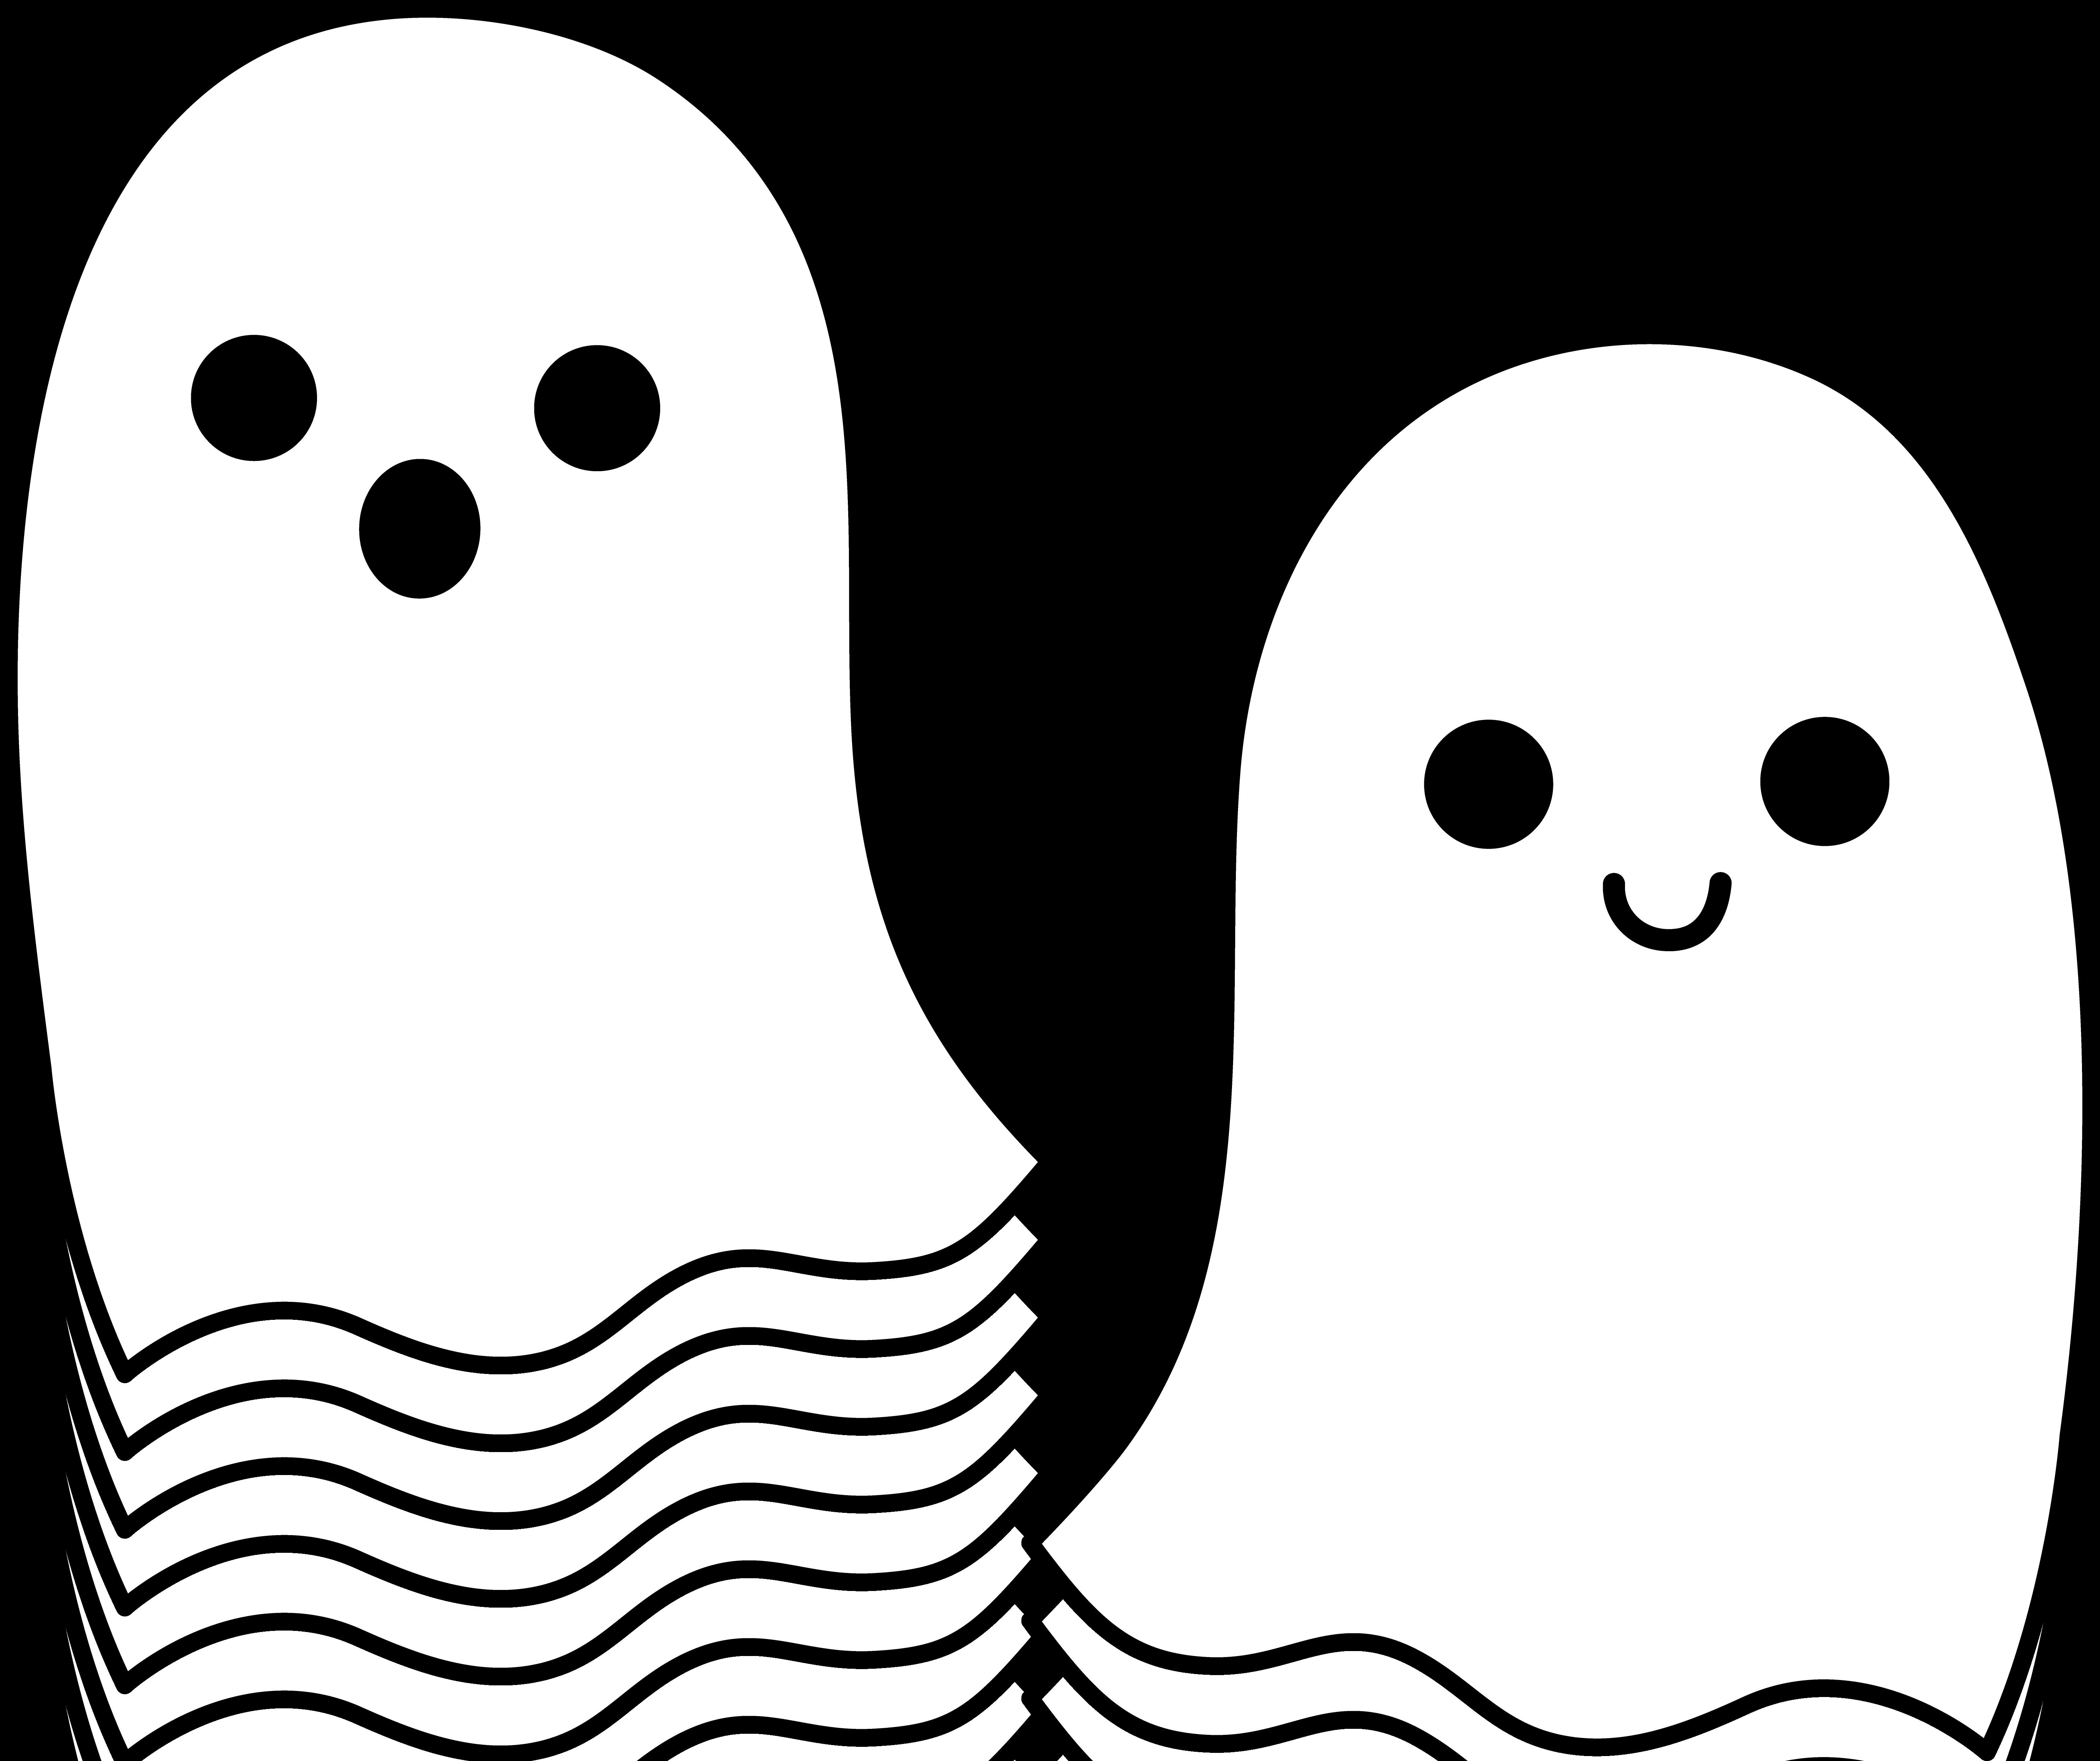 Cute Halloween Ghost Clip Art | Clipart -Cute Halloween Ghost Clip Art | Clipart library - Free Clipart Images-3